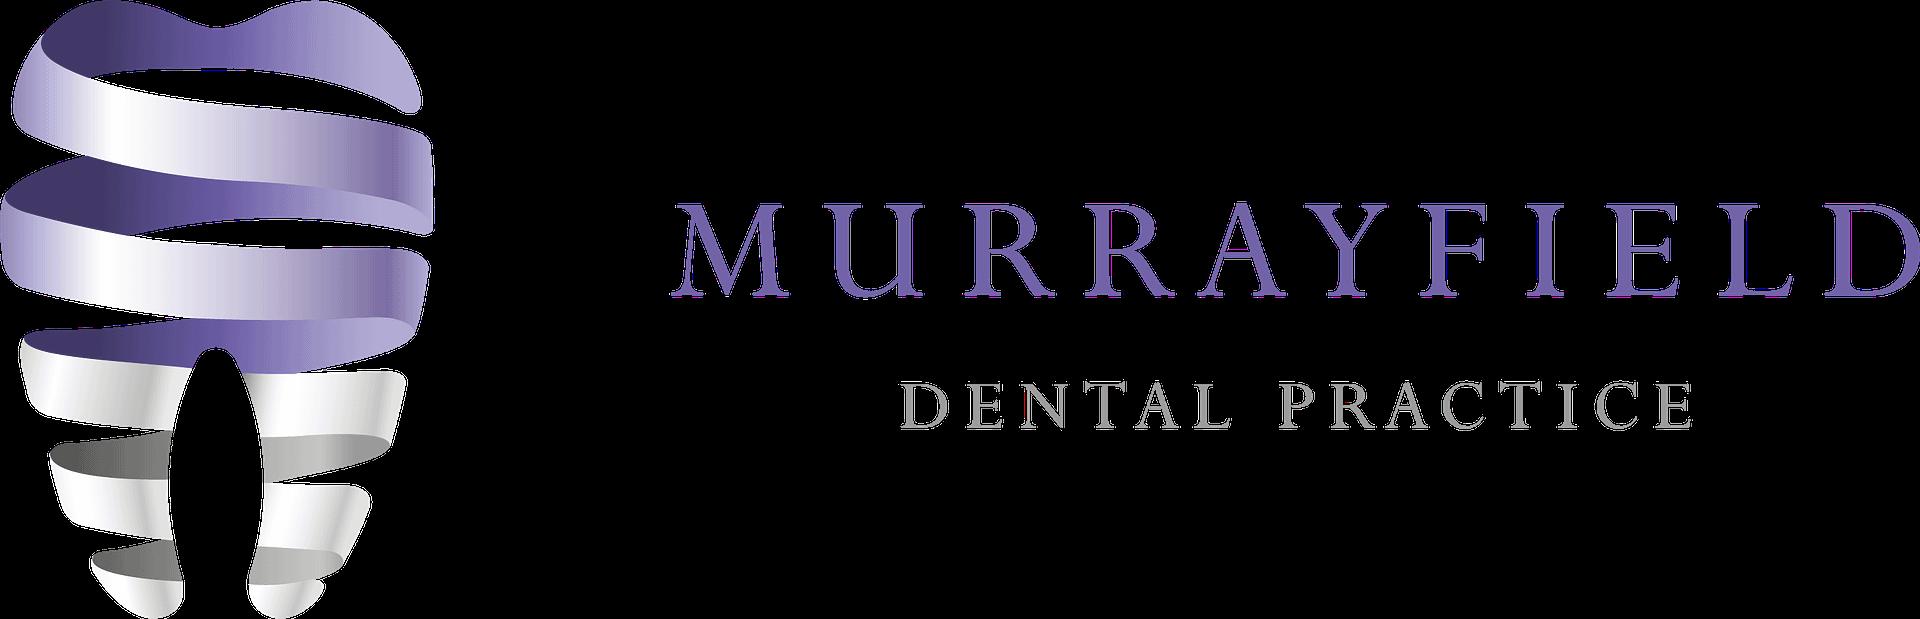 Murrayfield Dental Practice